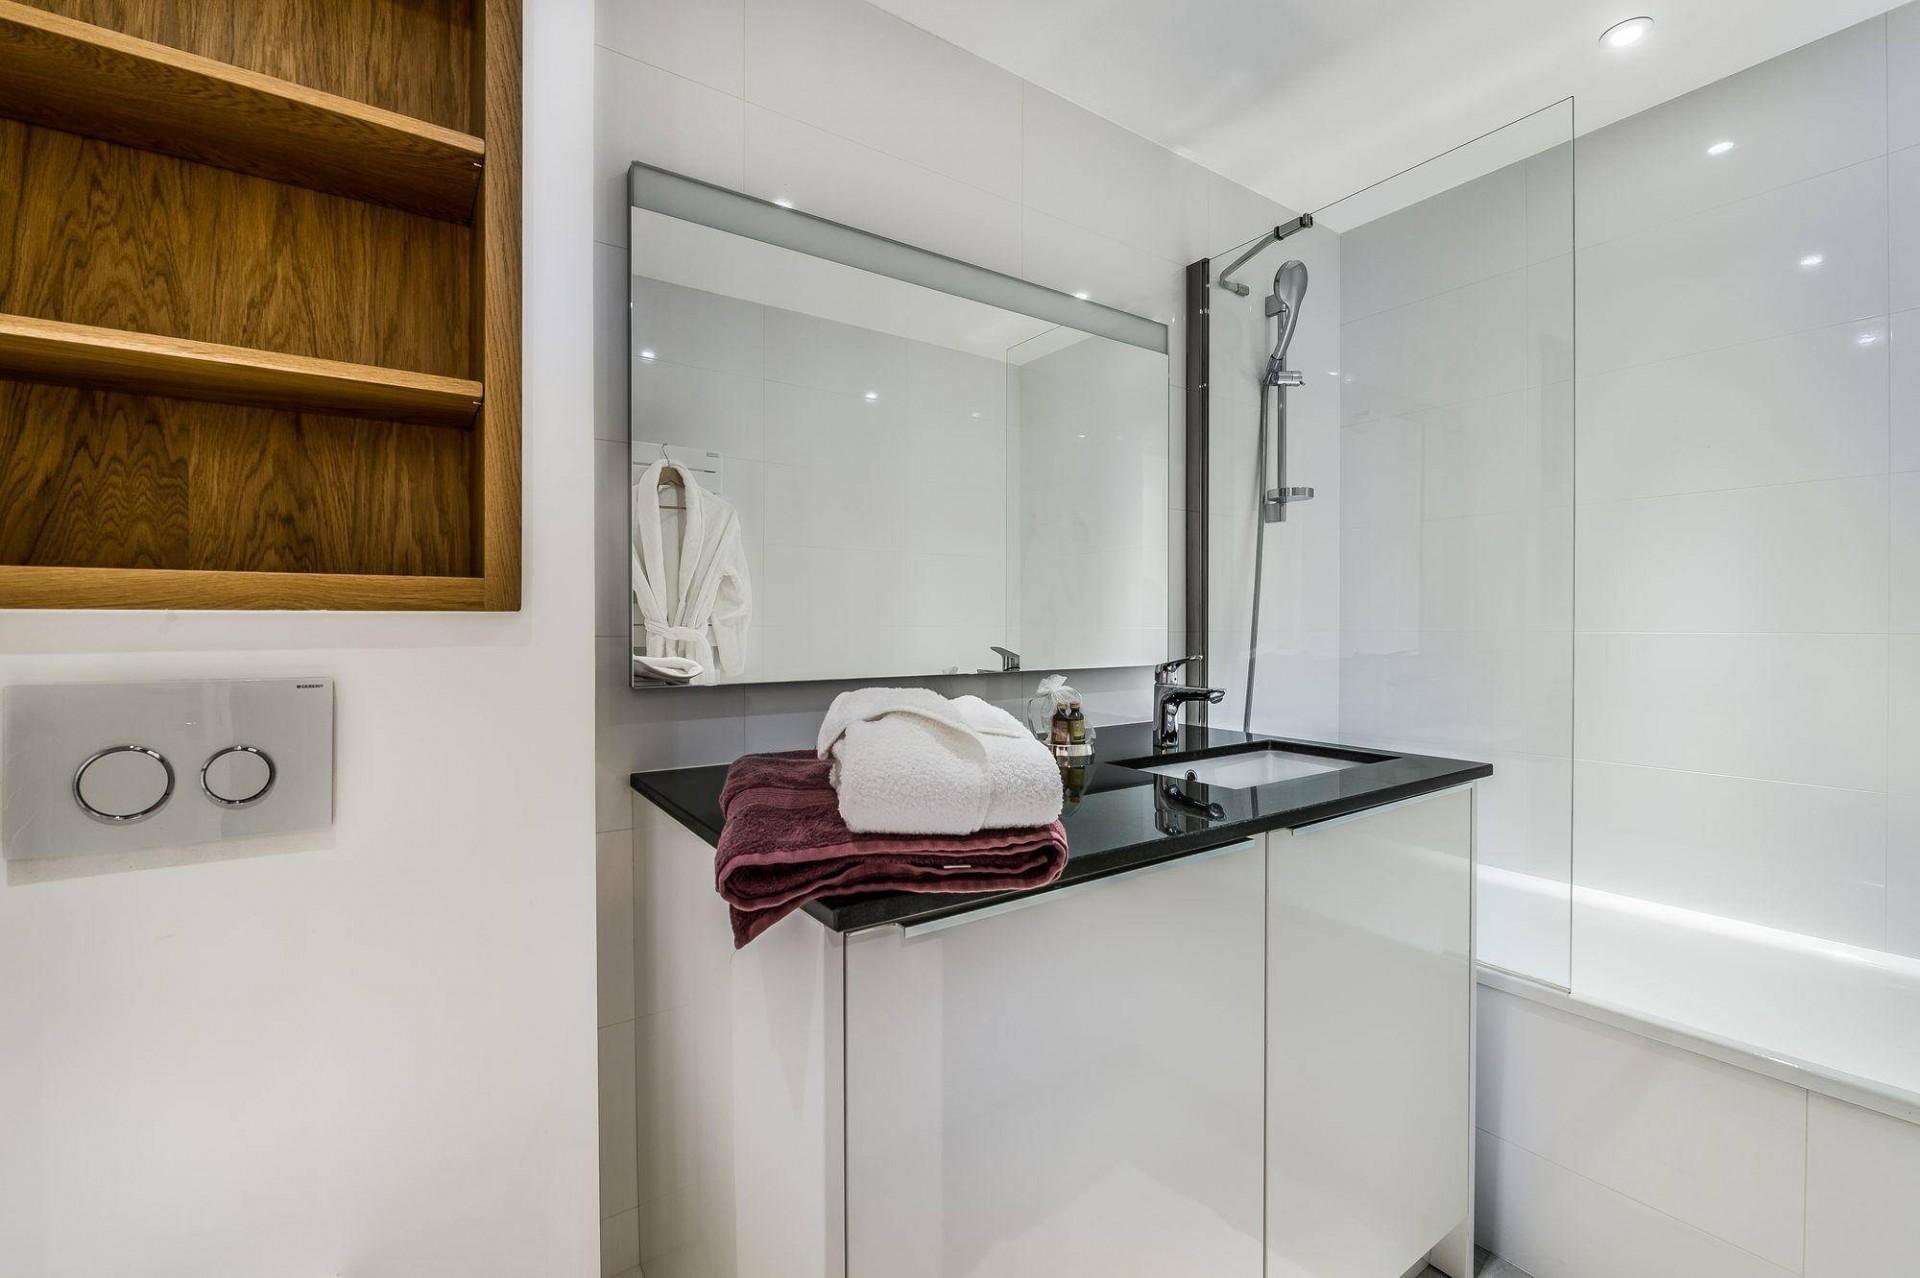 Val d'Isère Luxury Rental Appartment Eclaite Bathroom 2